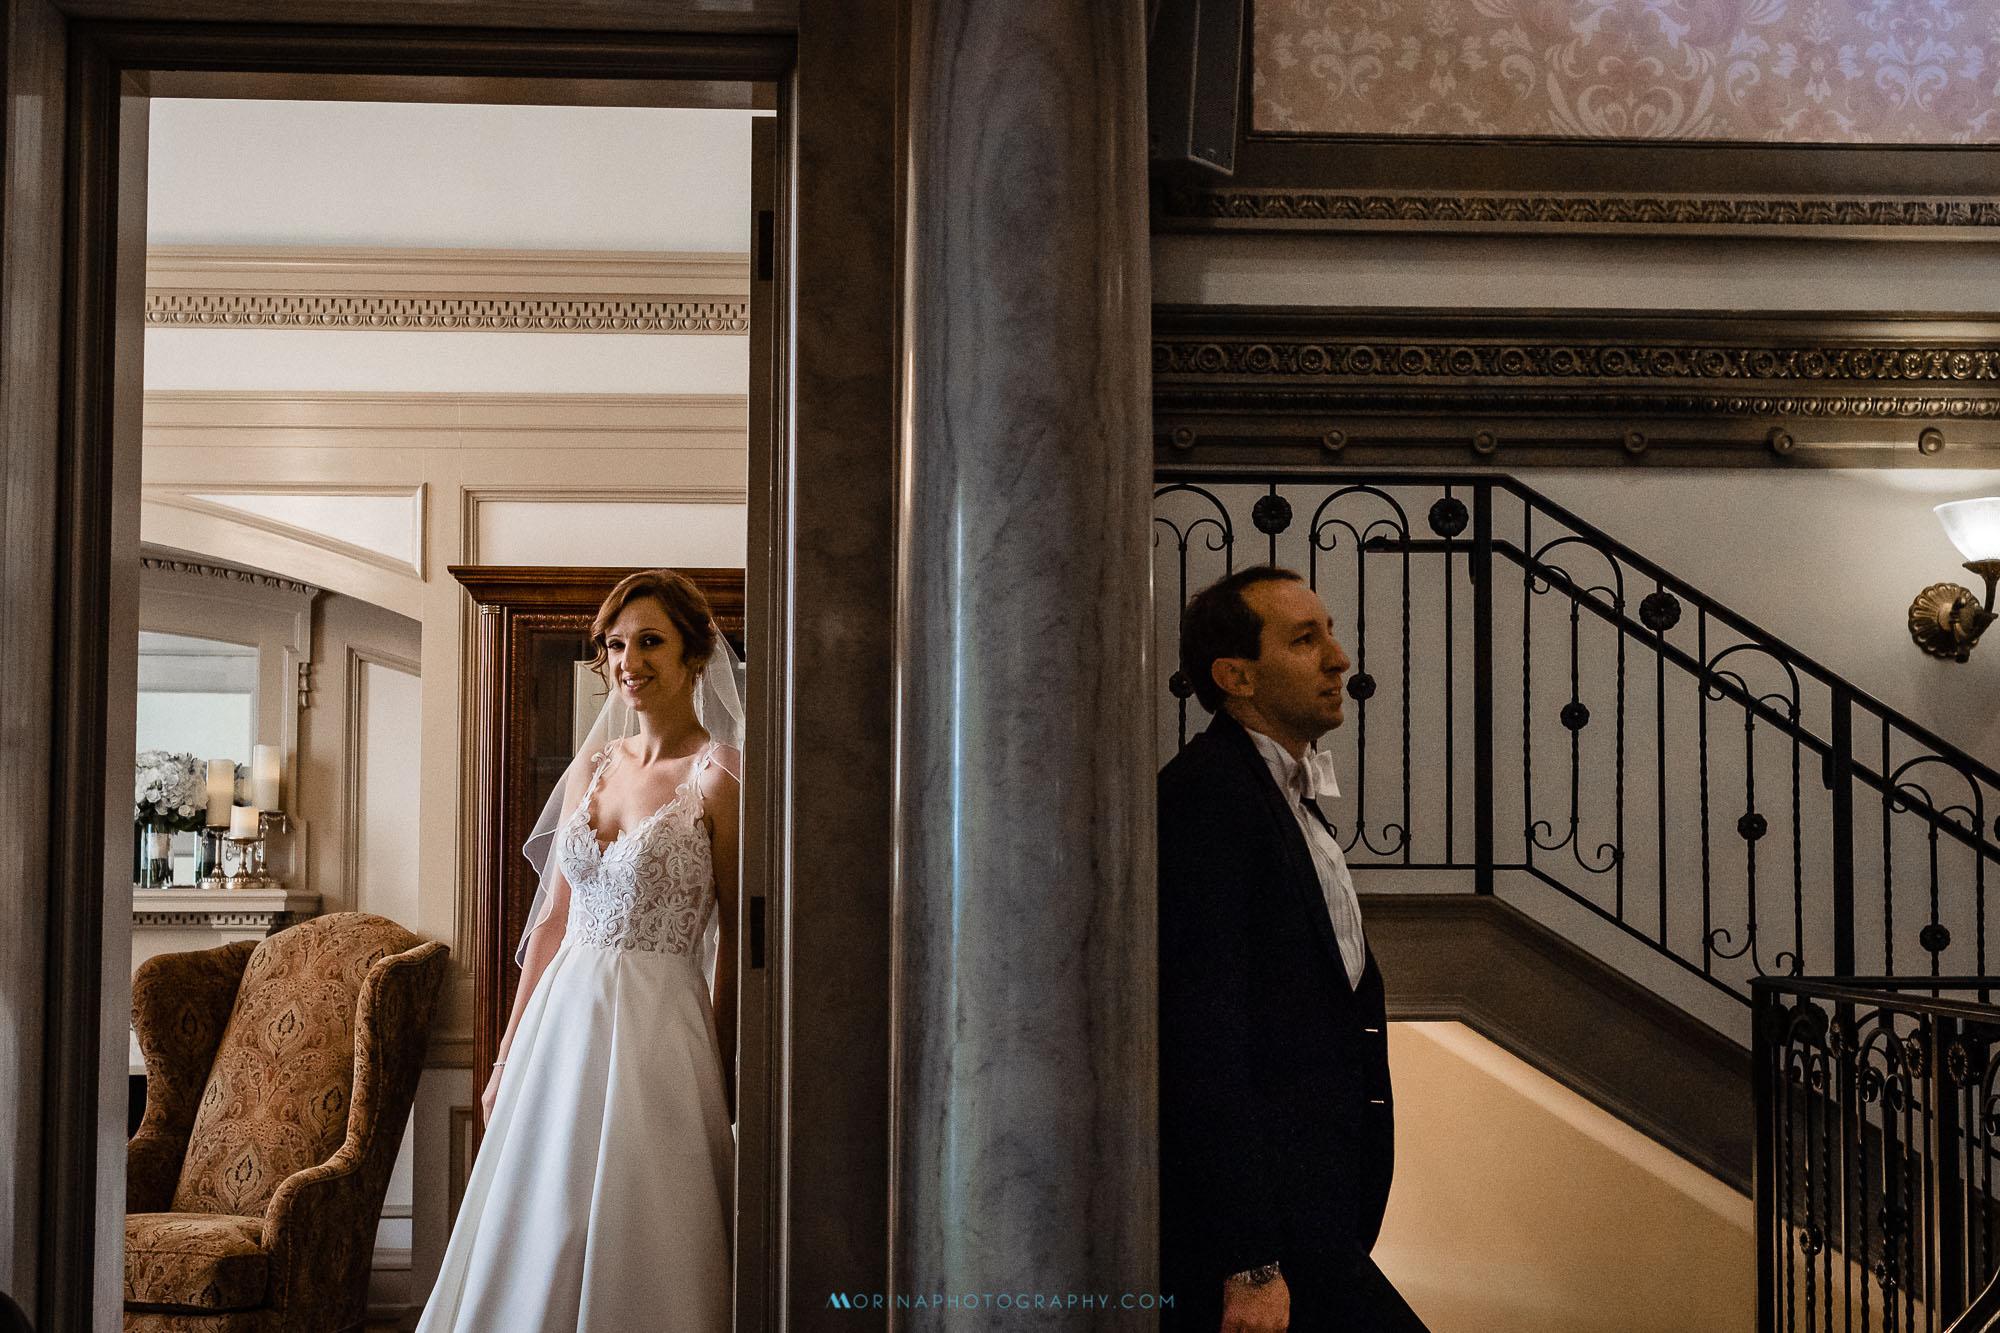 Ilhana & Jonathan Wedding at Vault 634 - Allentown 0026.jpg